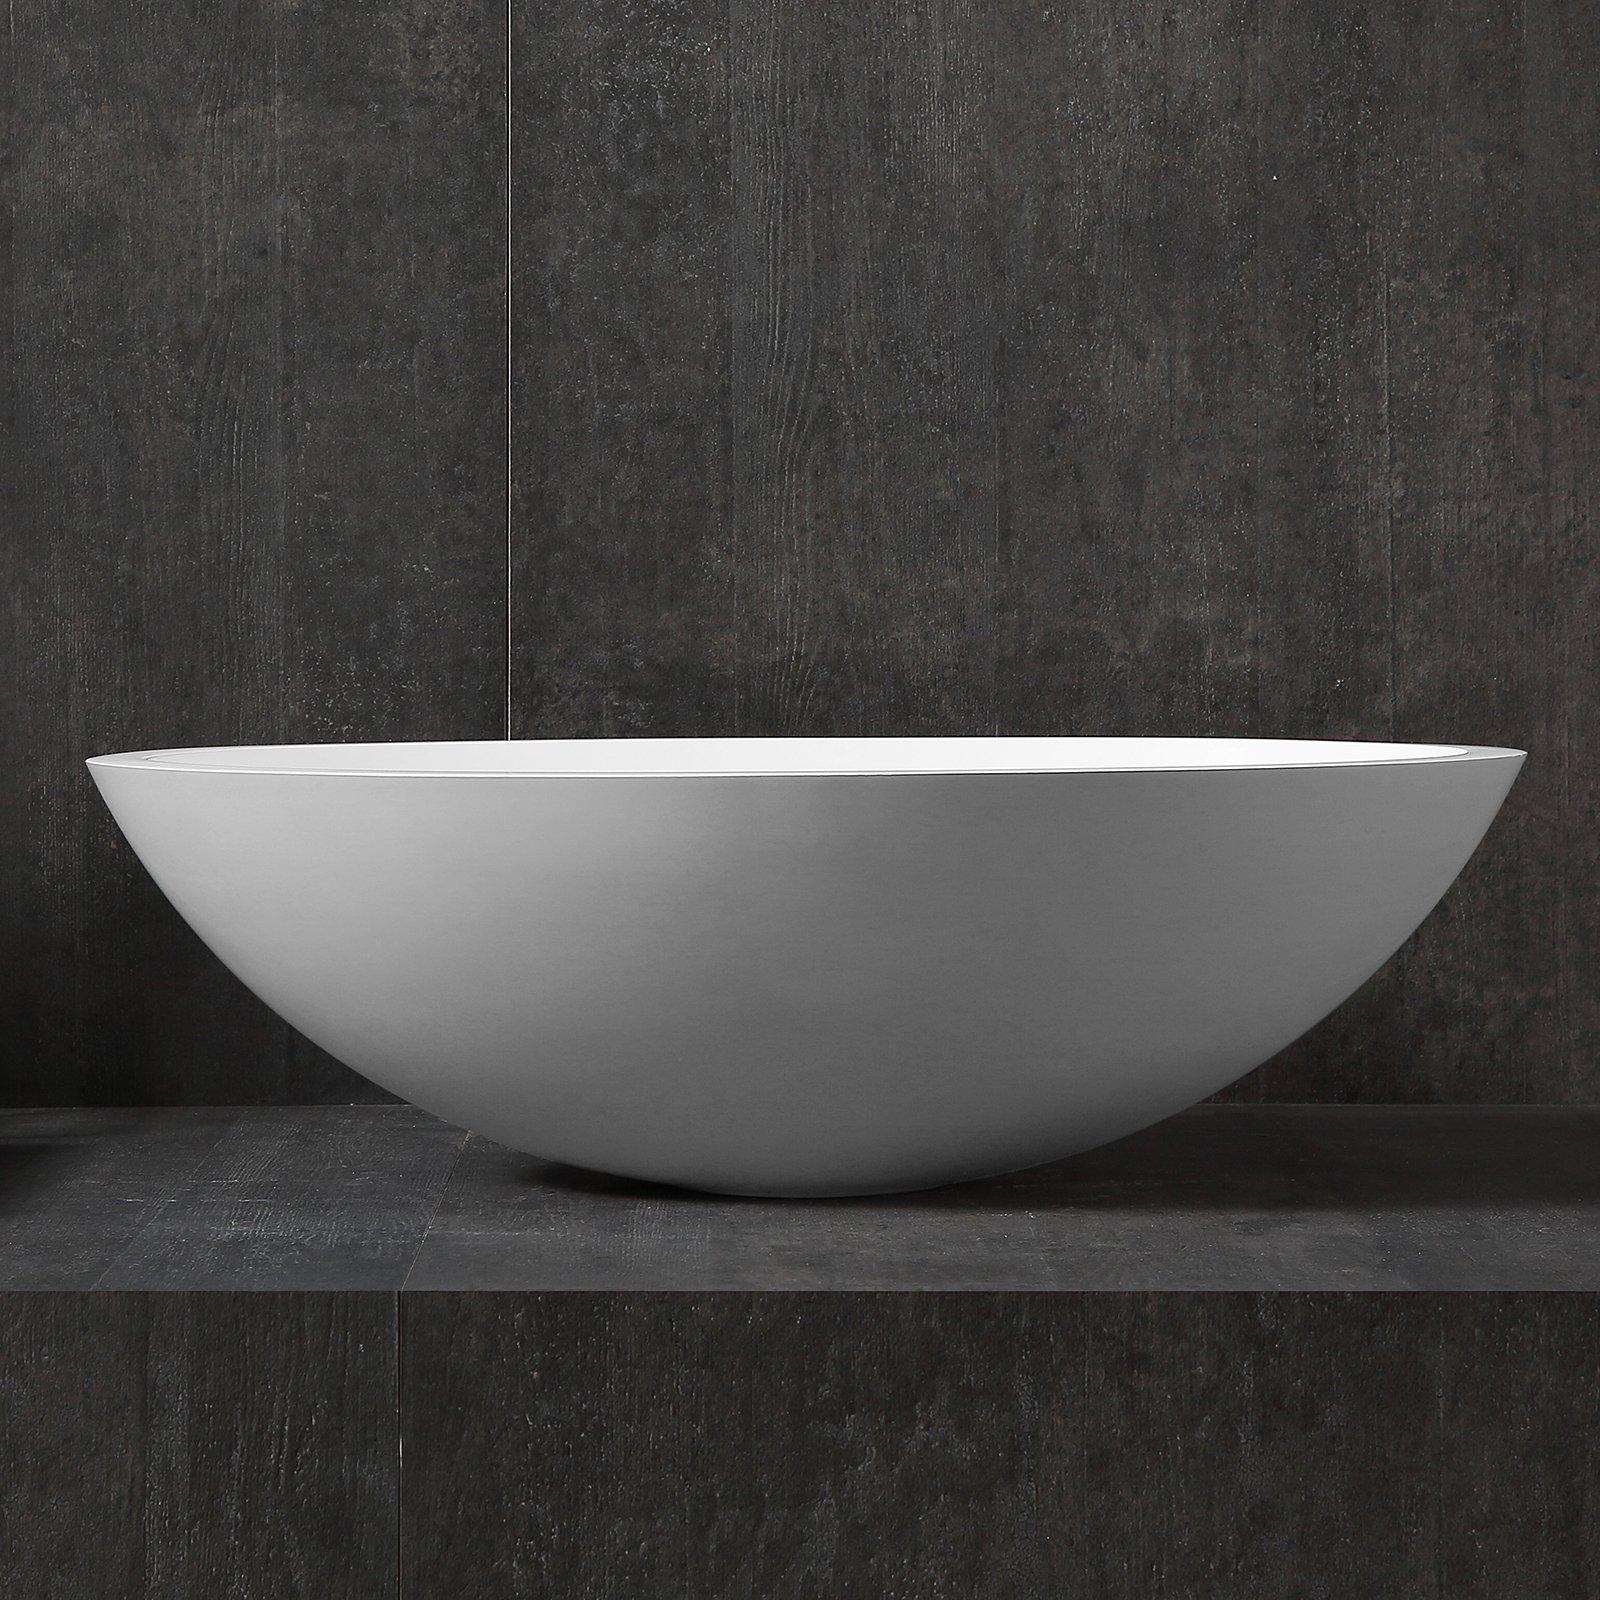 Aufsatzwaschbecken TW2106 aus Mineralguss Pure Acrylic - Matt - 50 x 35 x 15 cm zoom thumbnail 5